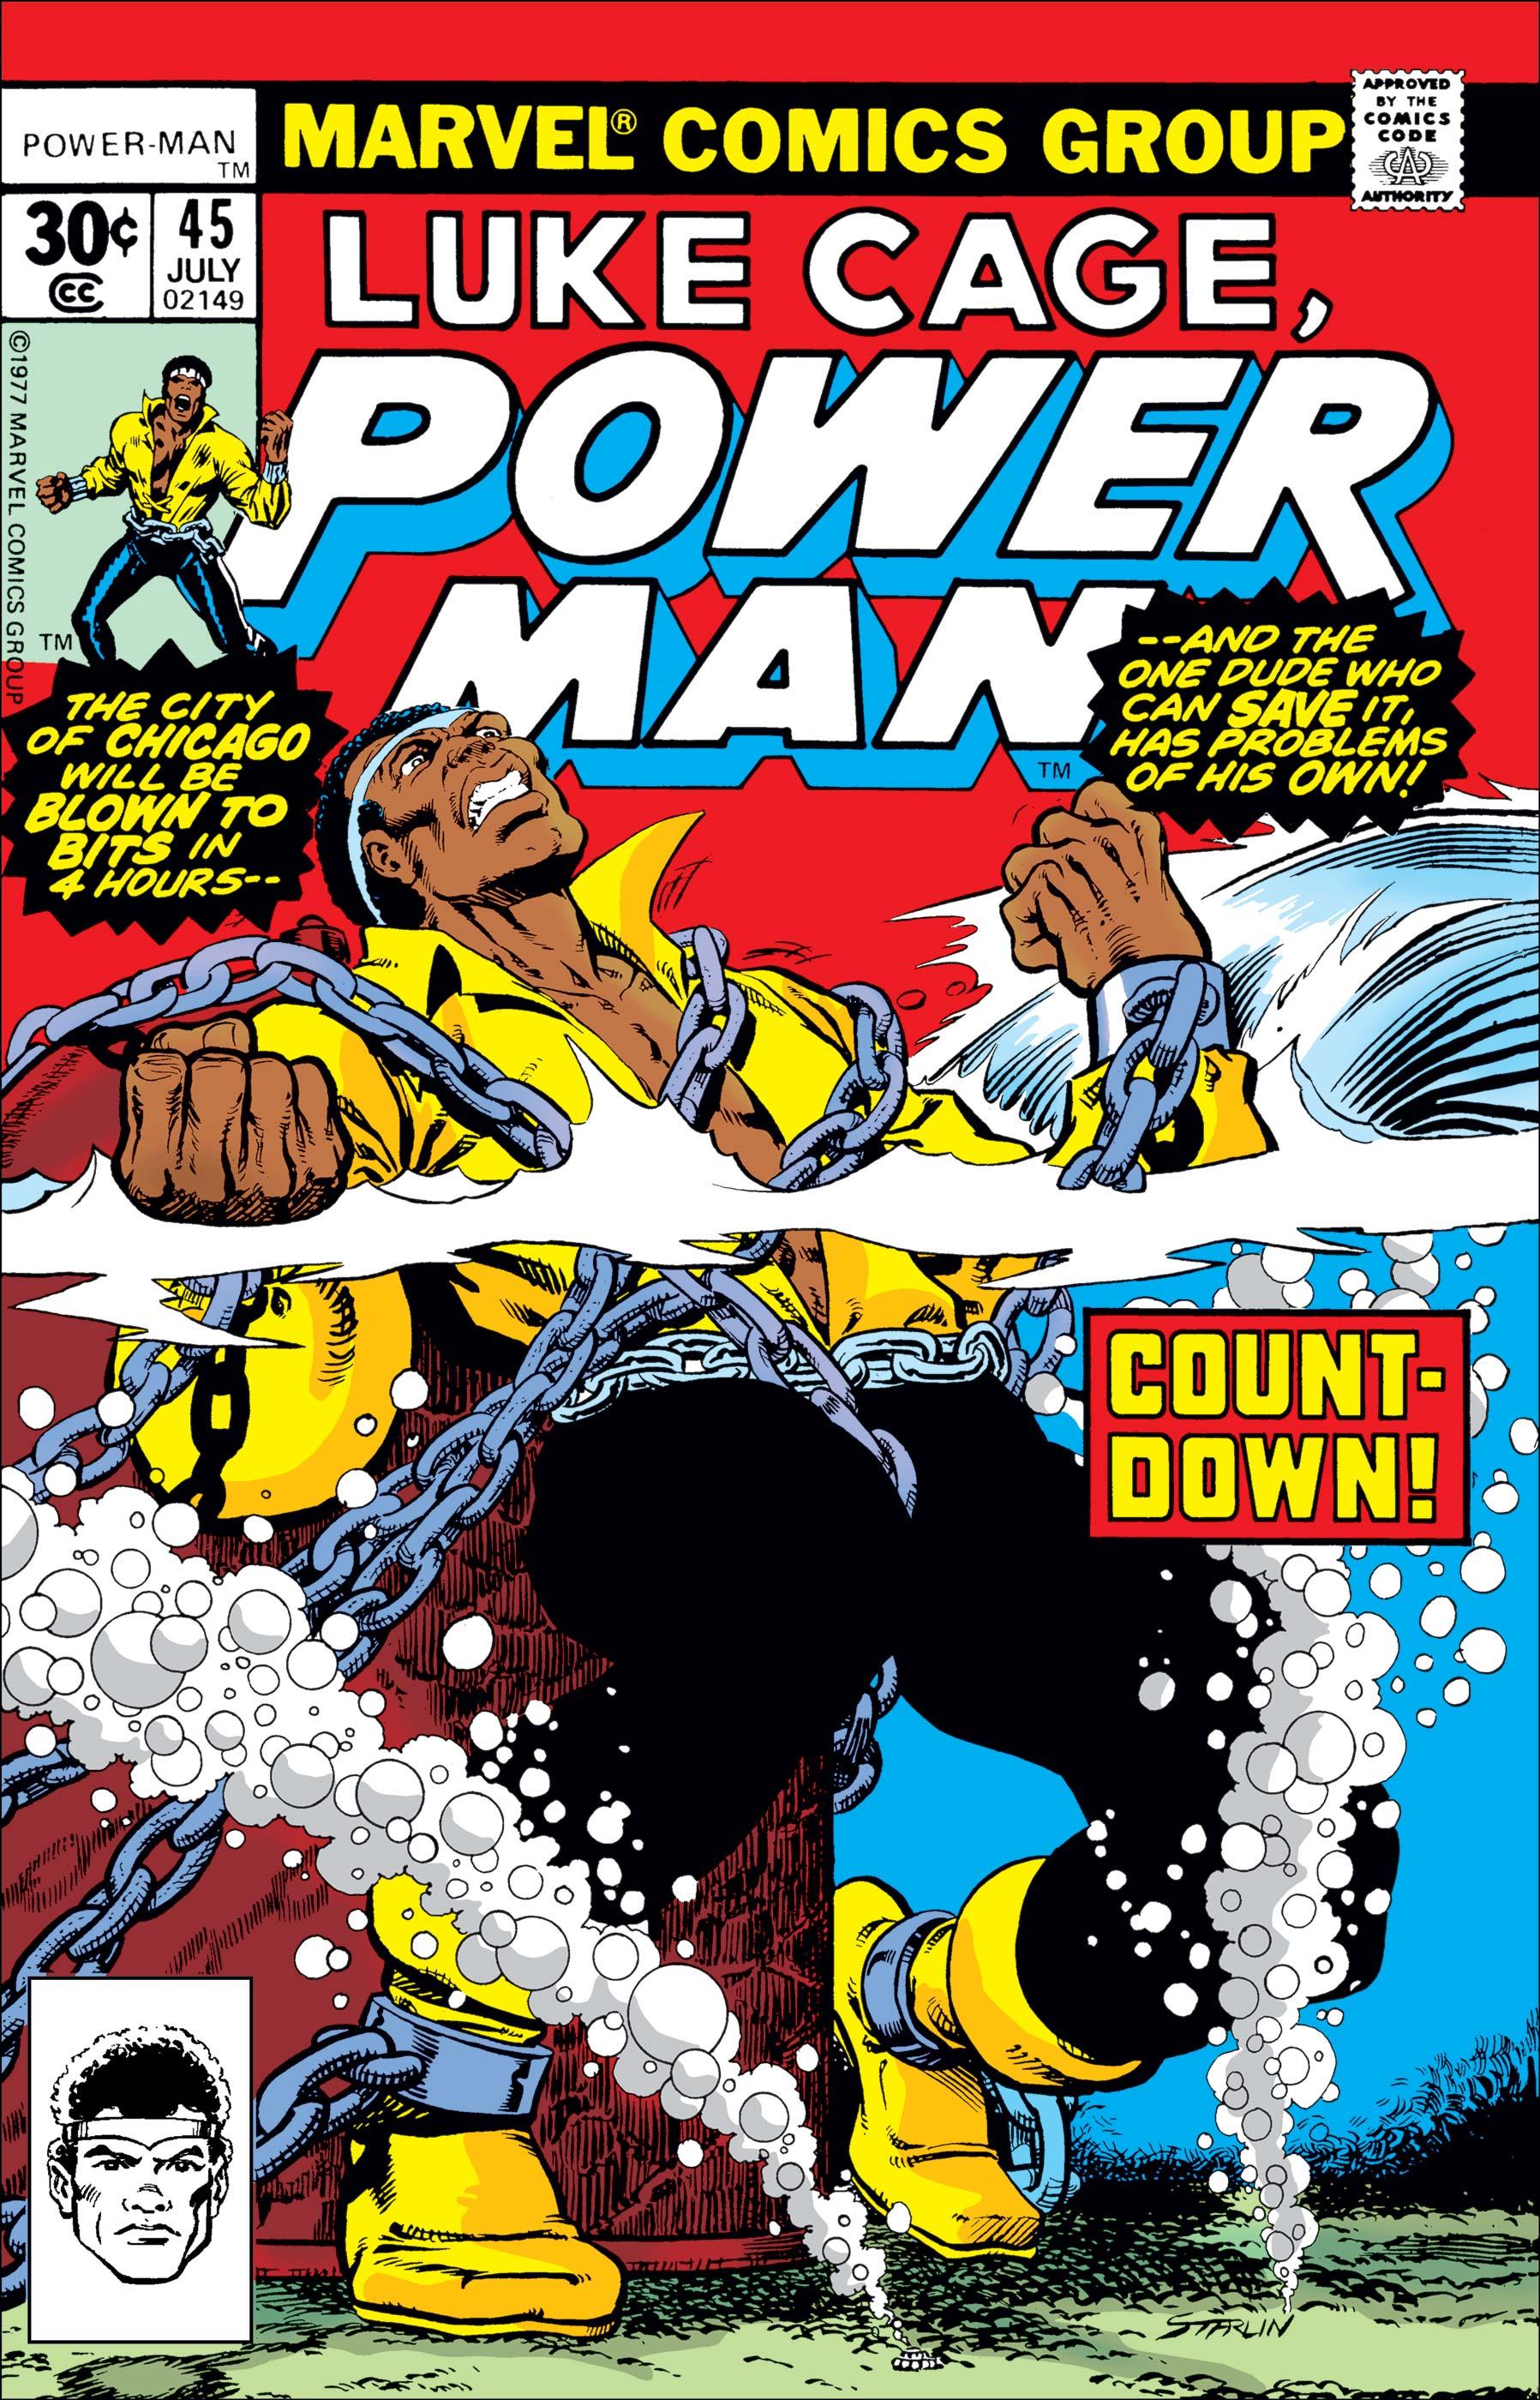 Power Man (1974) #45